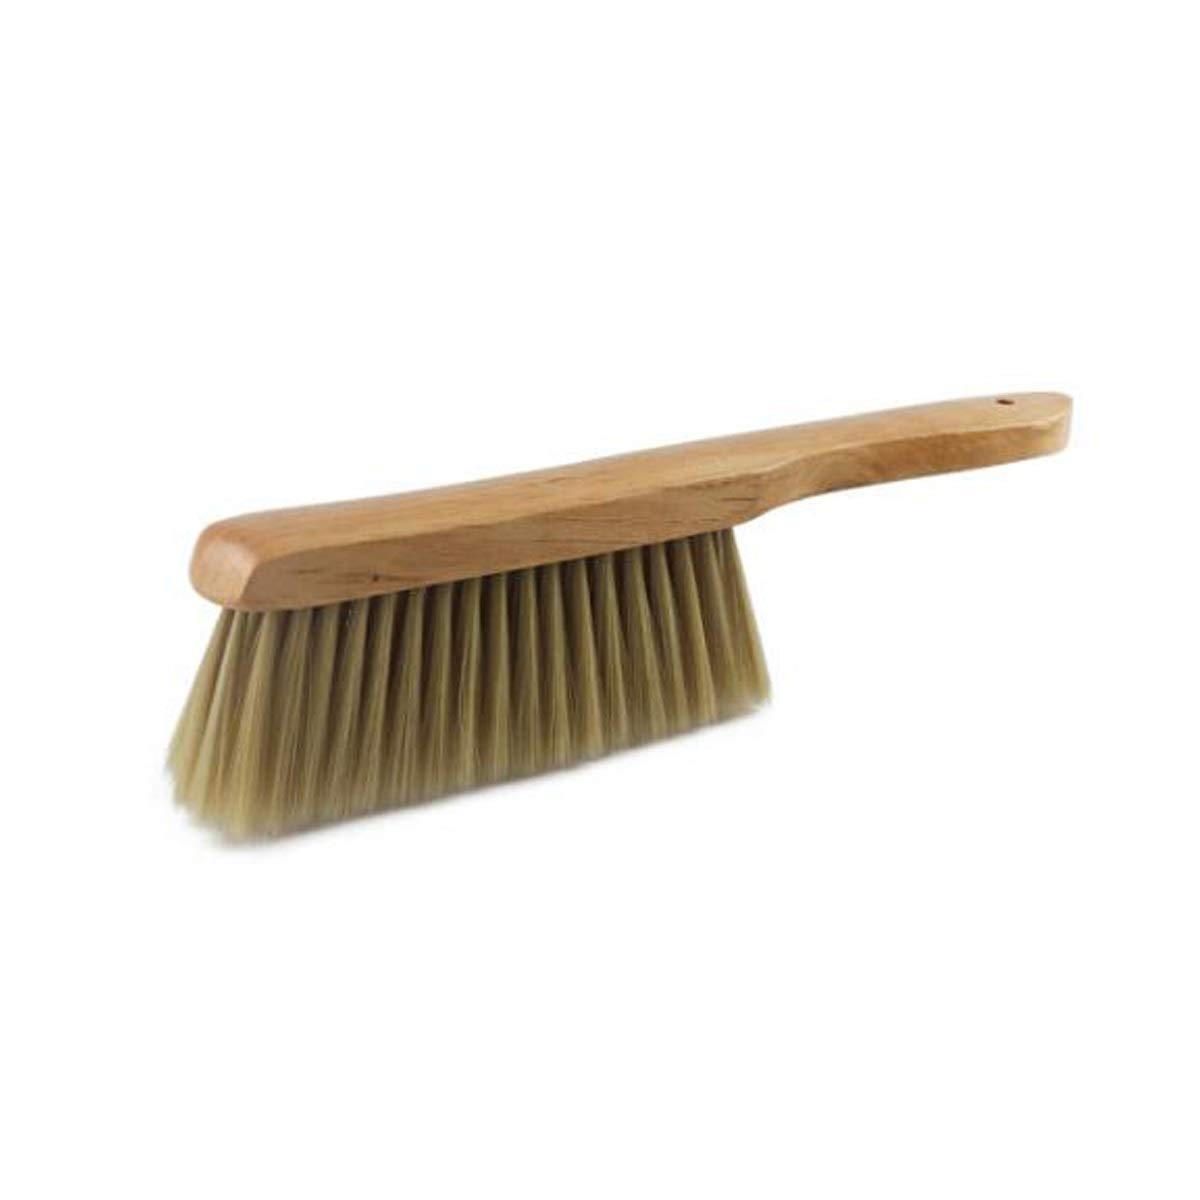 SHENGSHIHUIZHONG Household Soft Hair Bed Brush, Bedroom Sweeping Brush, Carpet Dusting Cleaning Brush, Anti-Static Sofa Brush, Bedding, (Material : Wood) by SHENGSHIHUIZHONG